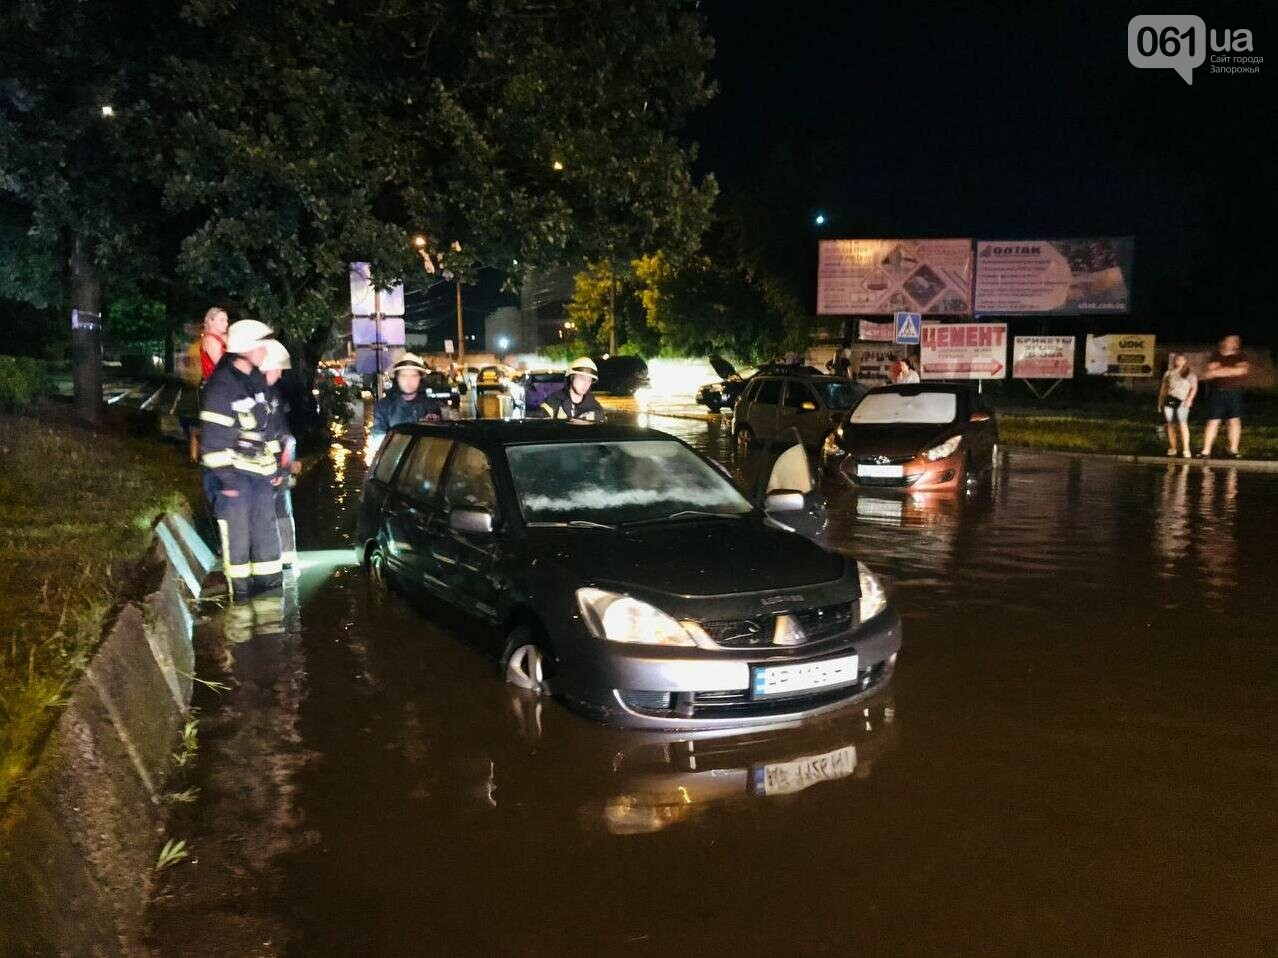 photo2021 06 1408 20 12 60c6fbb590e6f - В центре Запорожья из-за сильного ливня в воде застряли автомобили и подтопило многоэтажку